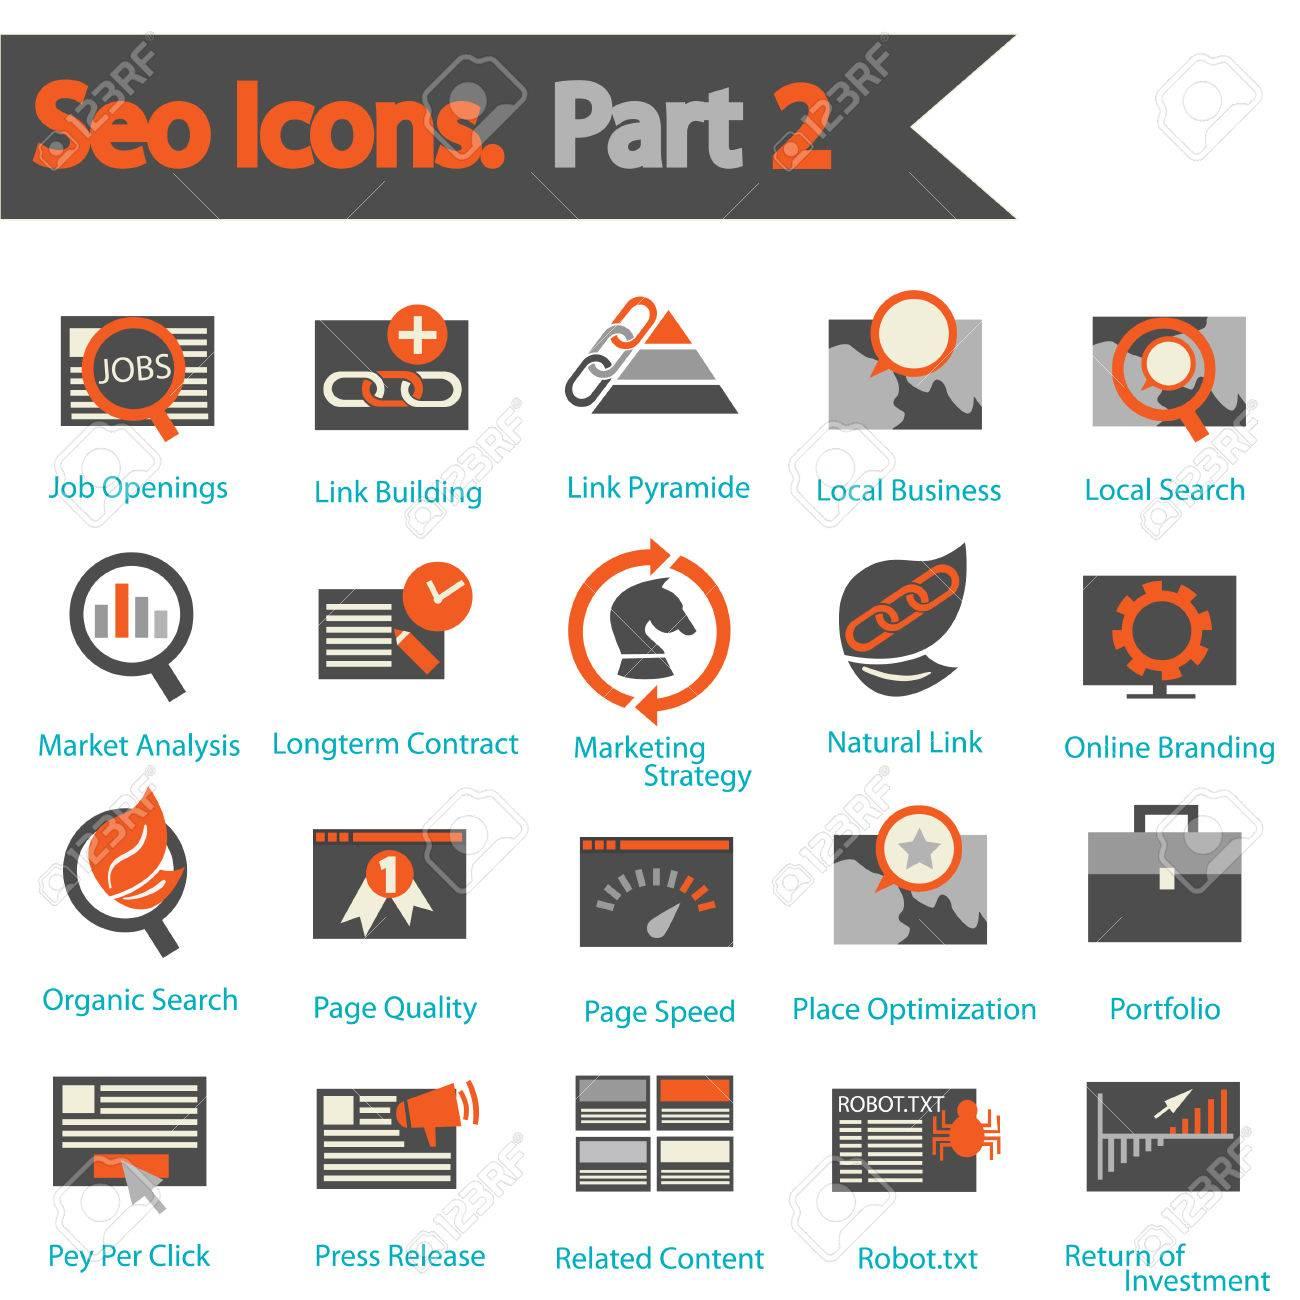 seo icon set part 2 royalty cliparts vectors and stock seo icon set part 2 stock vector 25320242